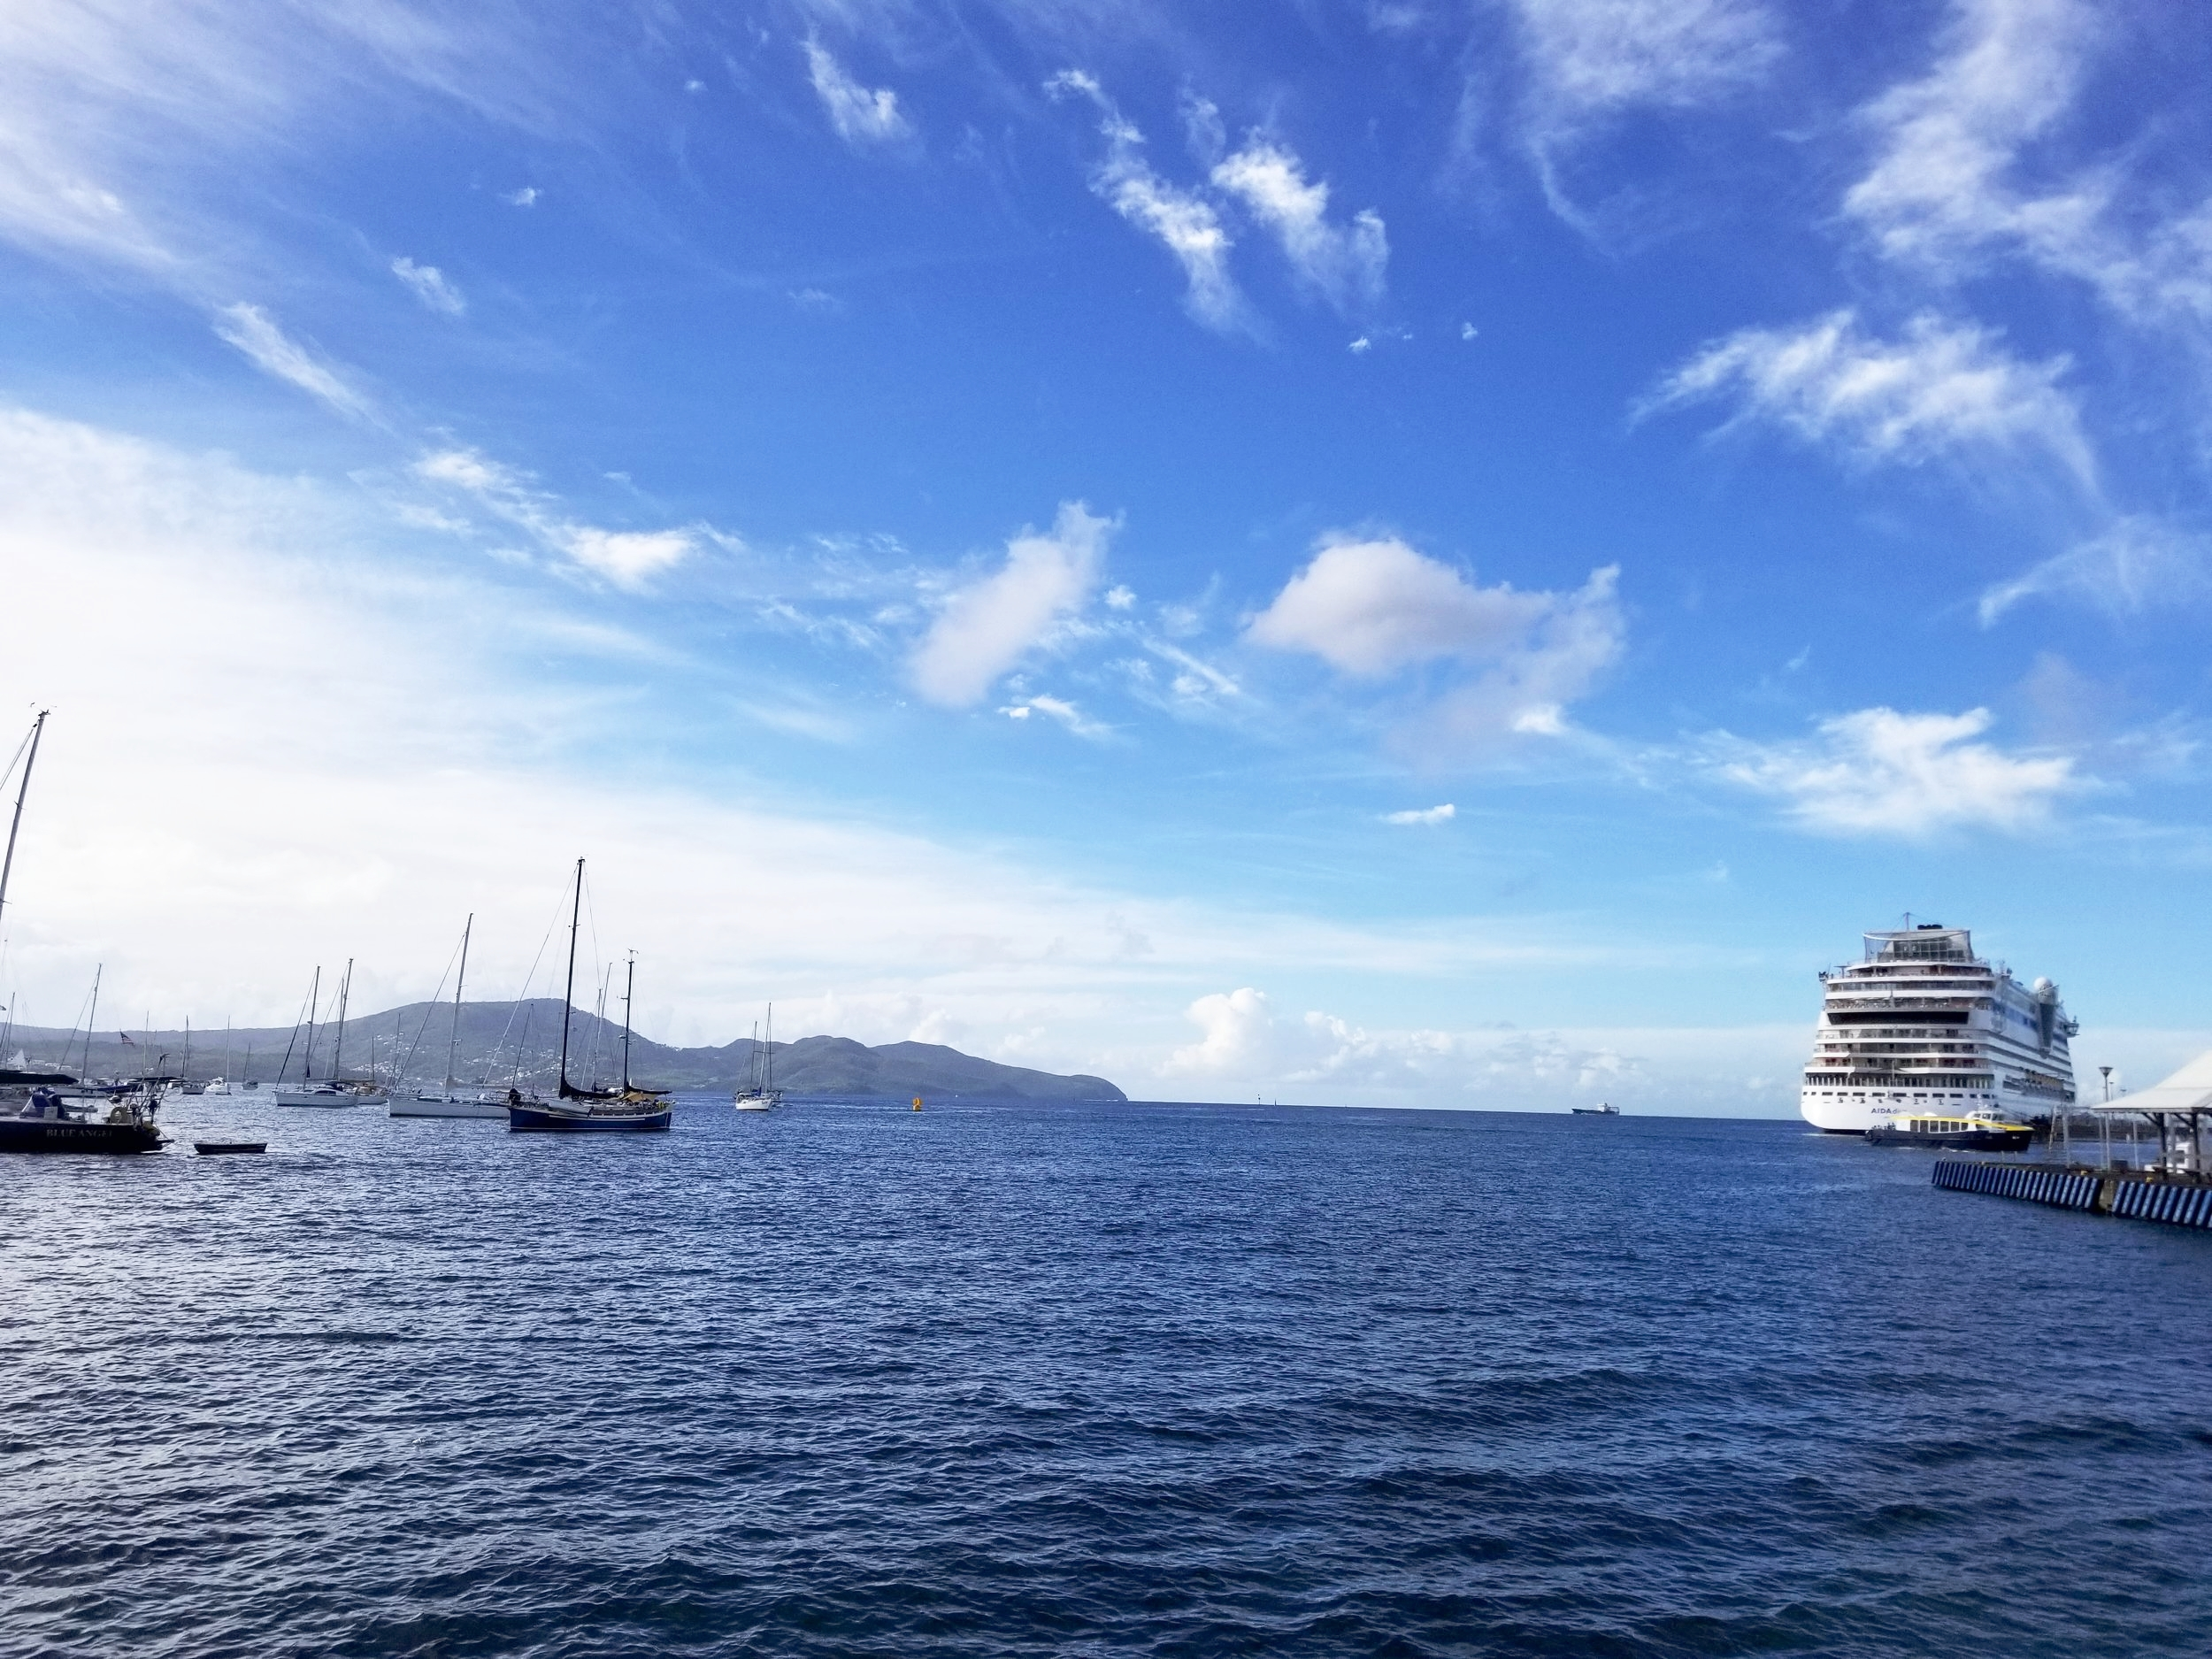 Cruise Ship Docking in Fort-De-France Harbor, Martinique, France